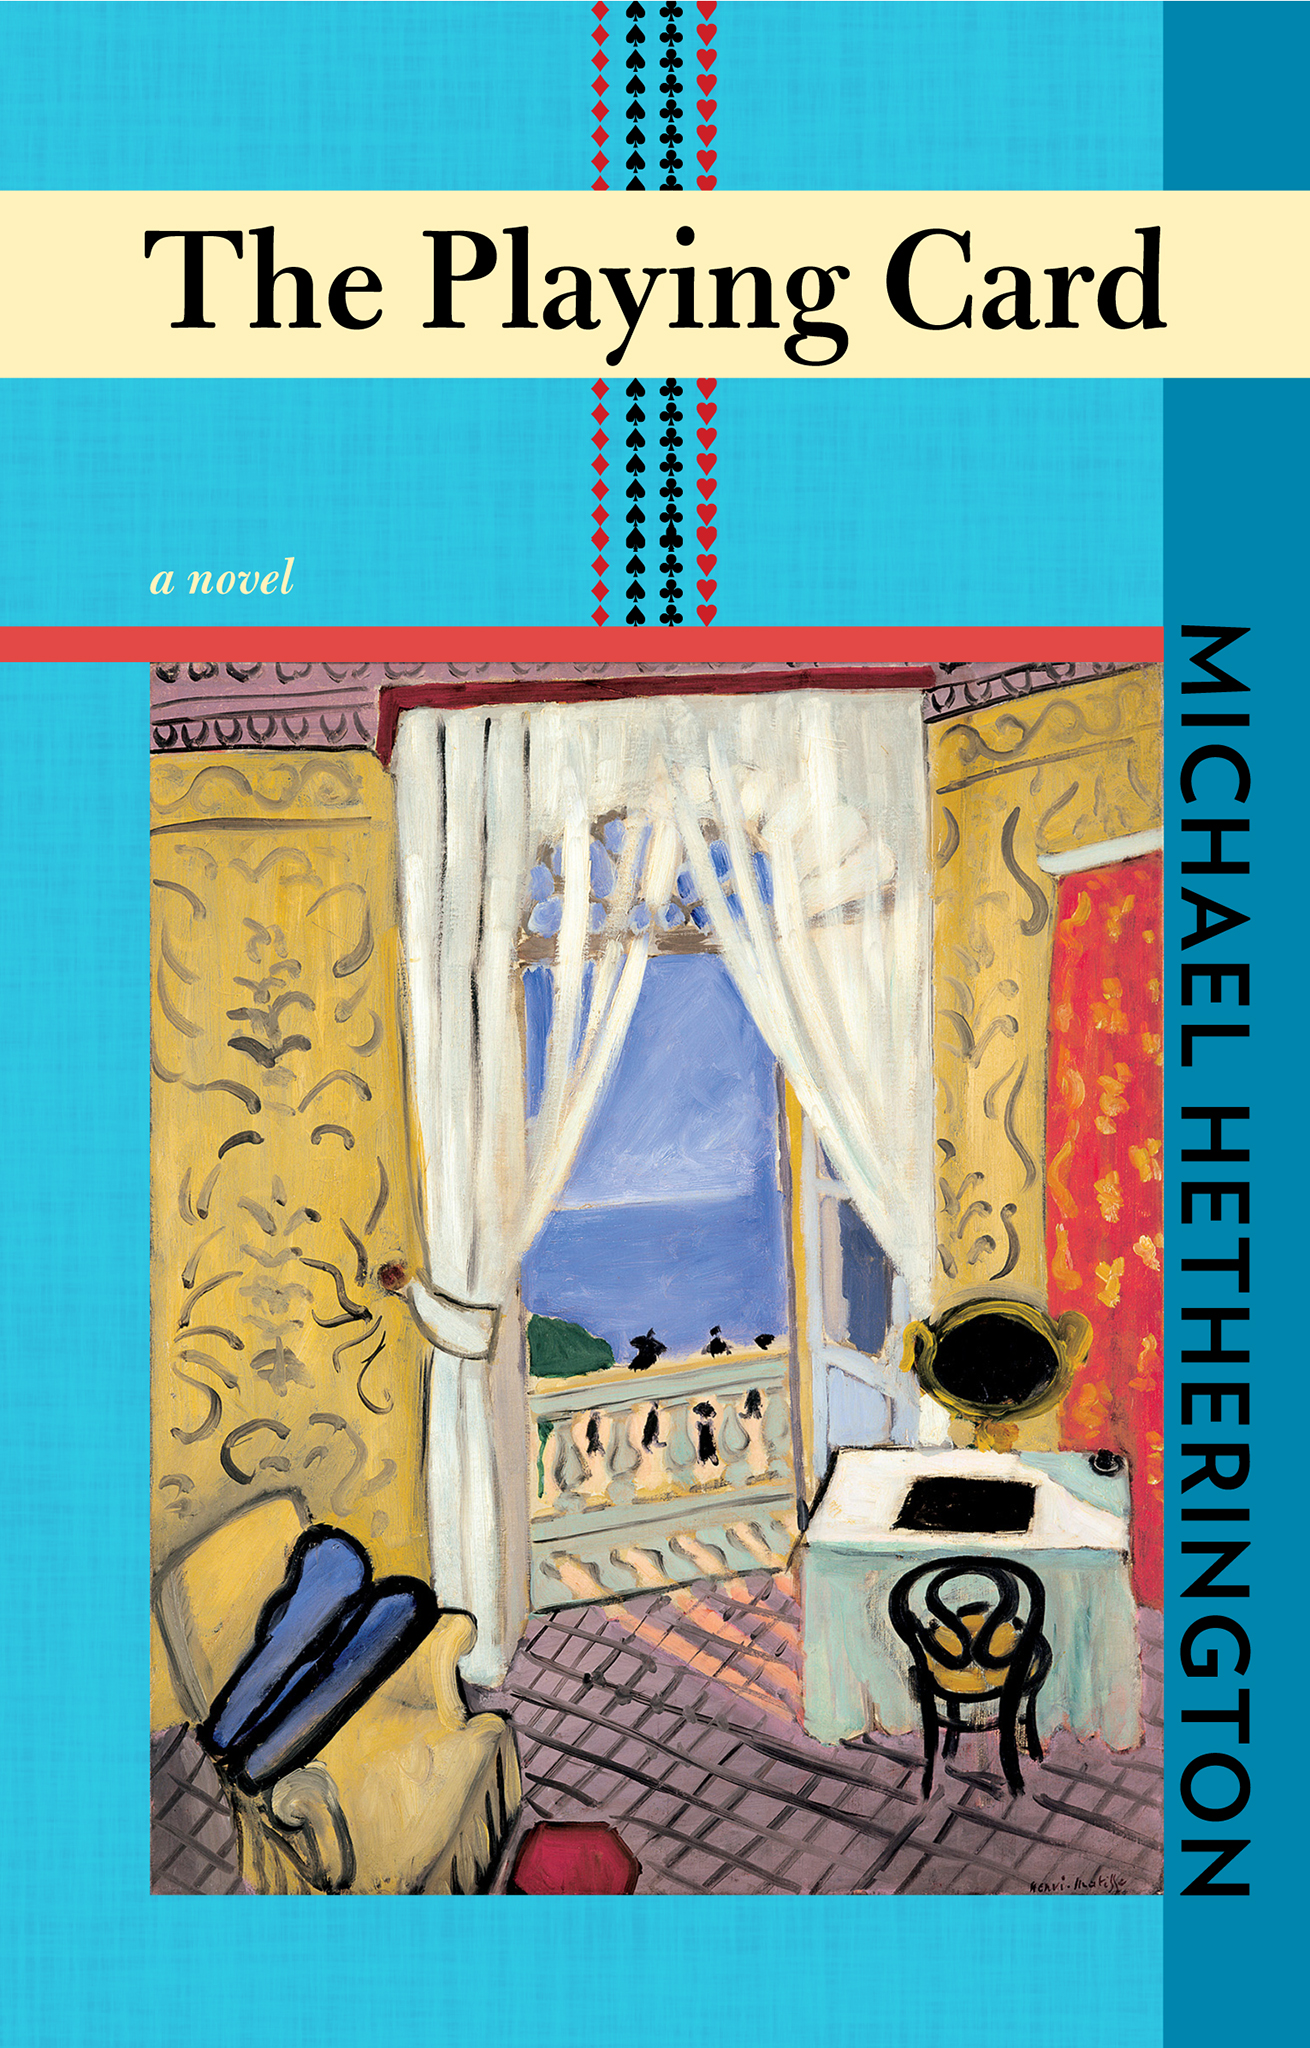 Michael Hetherington / Passfield Press